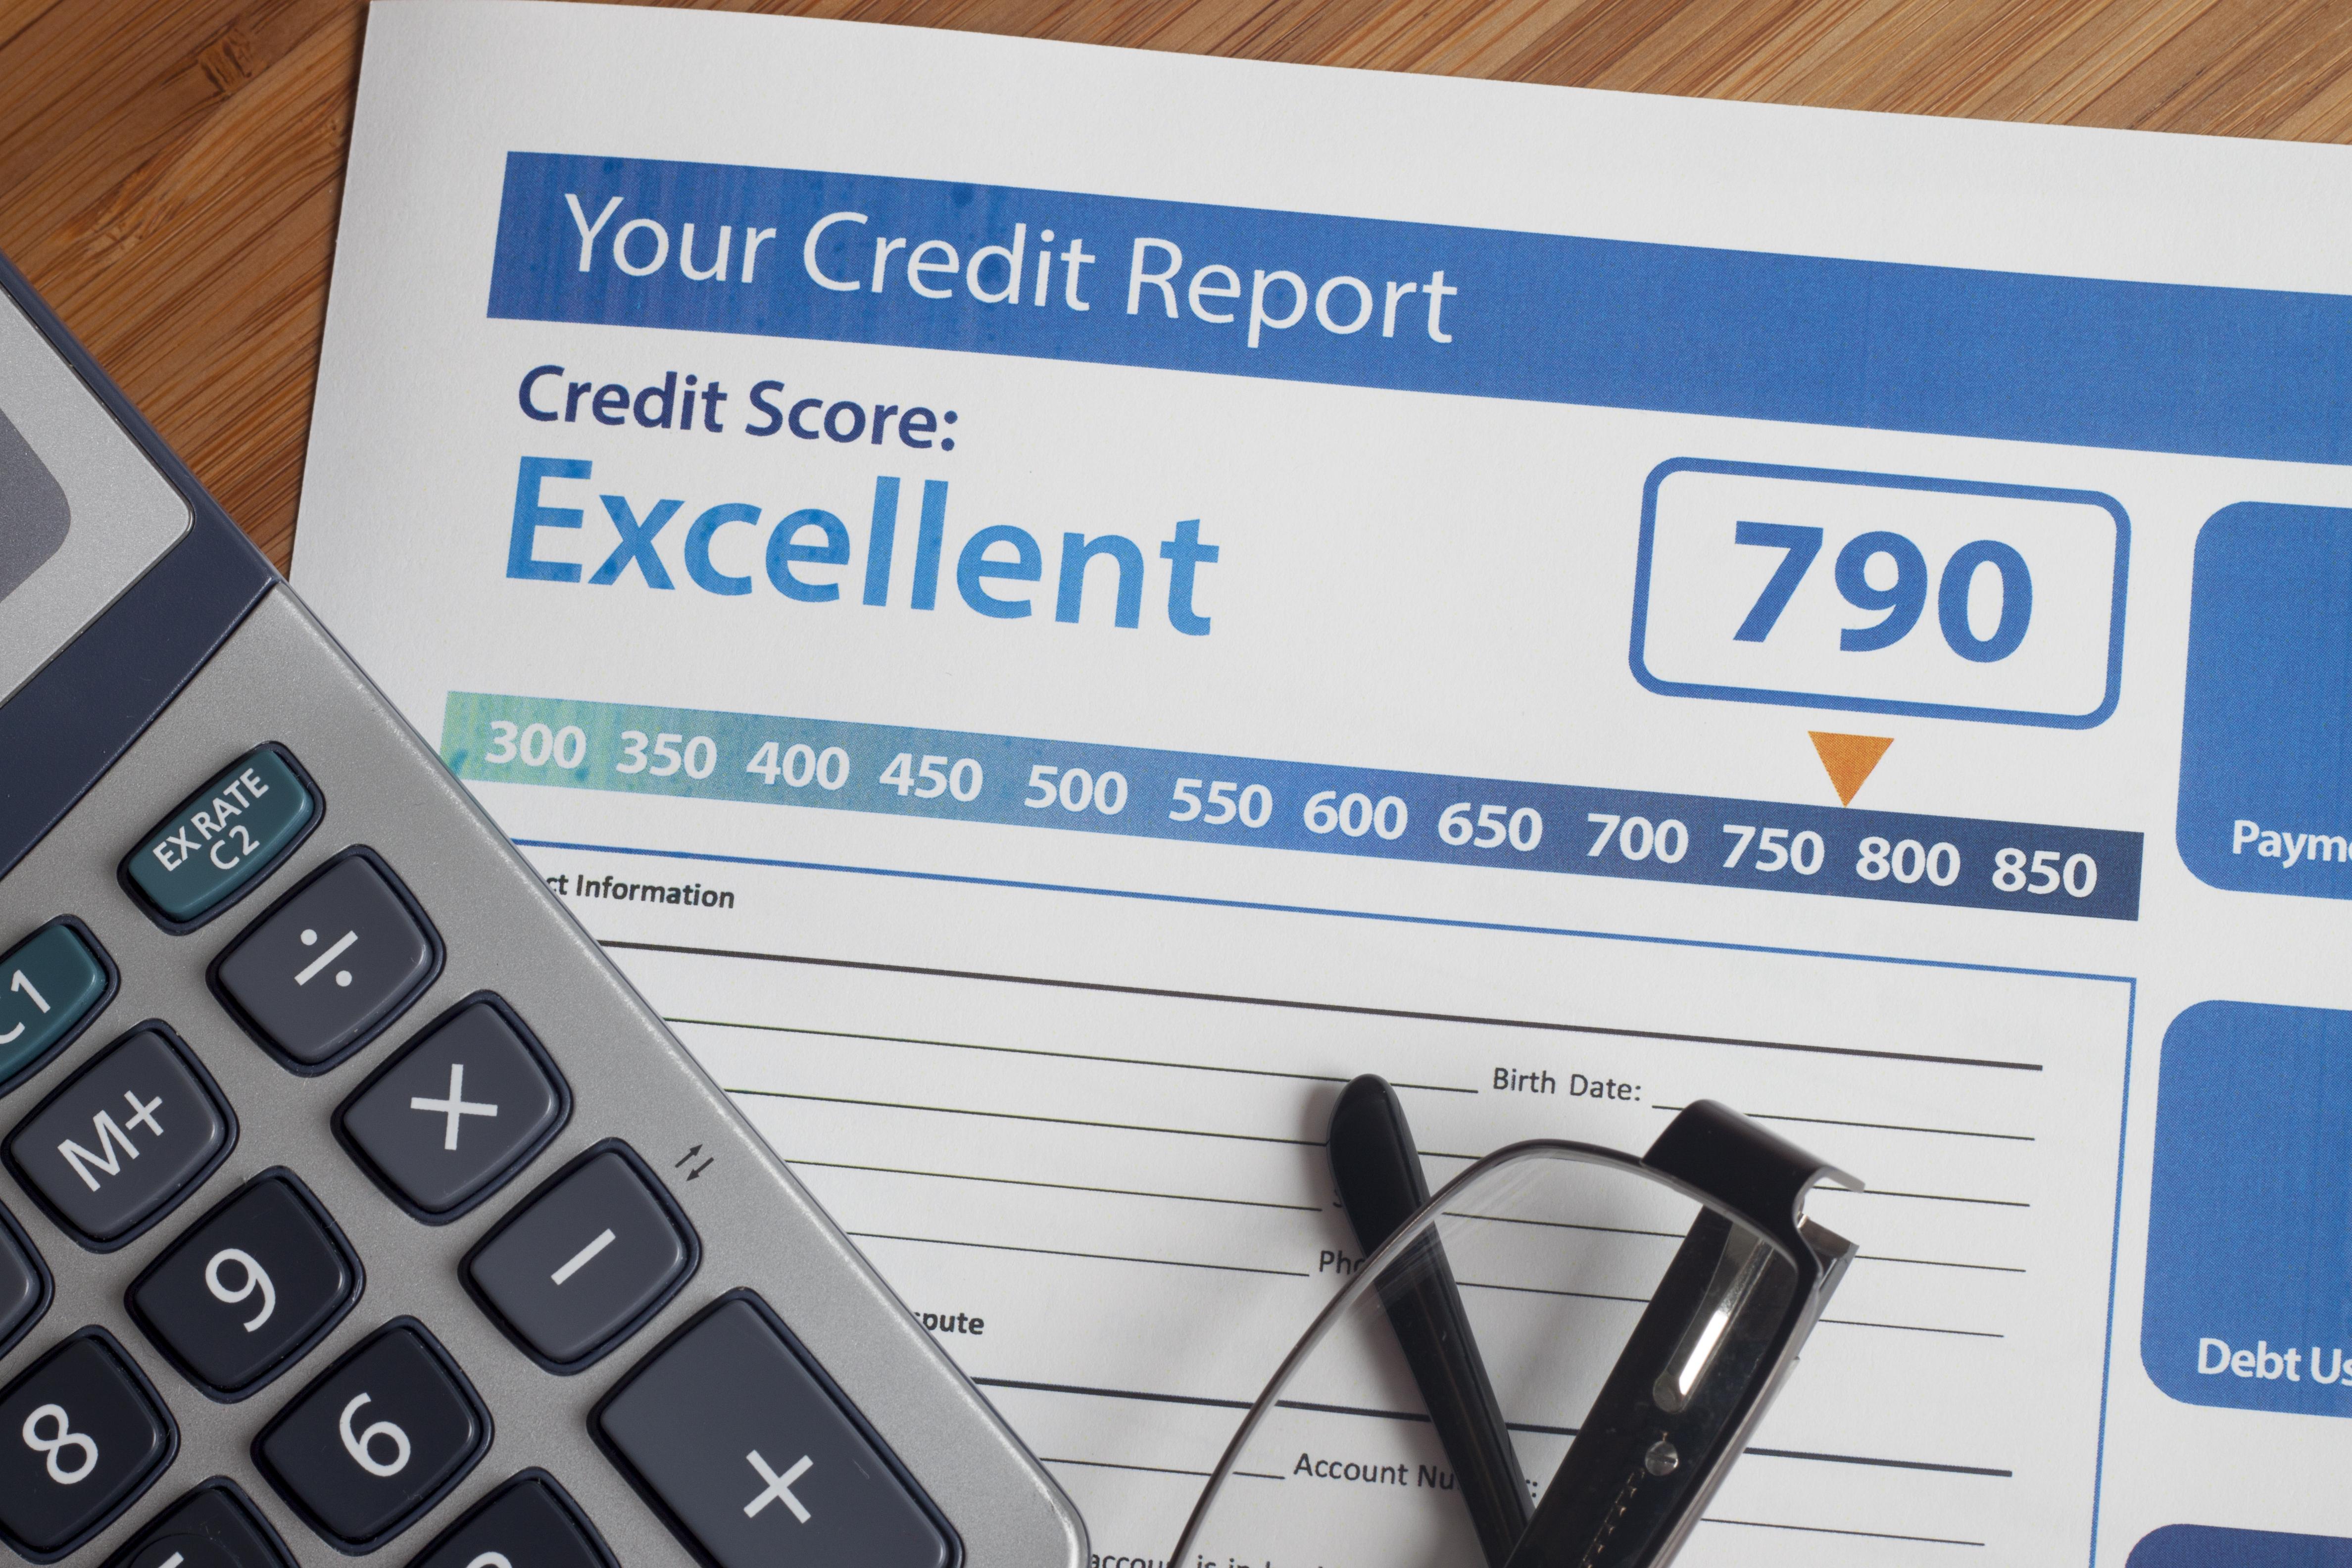 Copy of credit report.